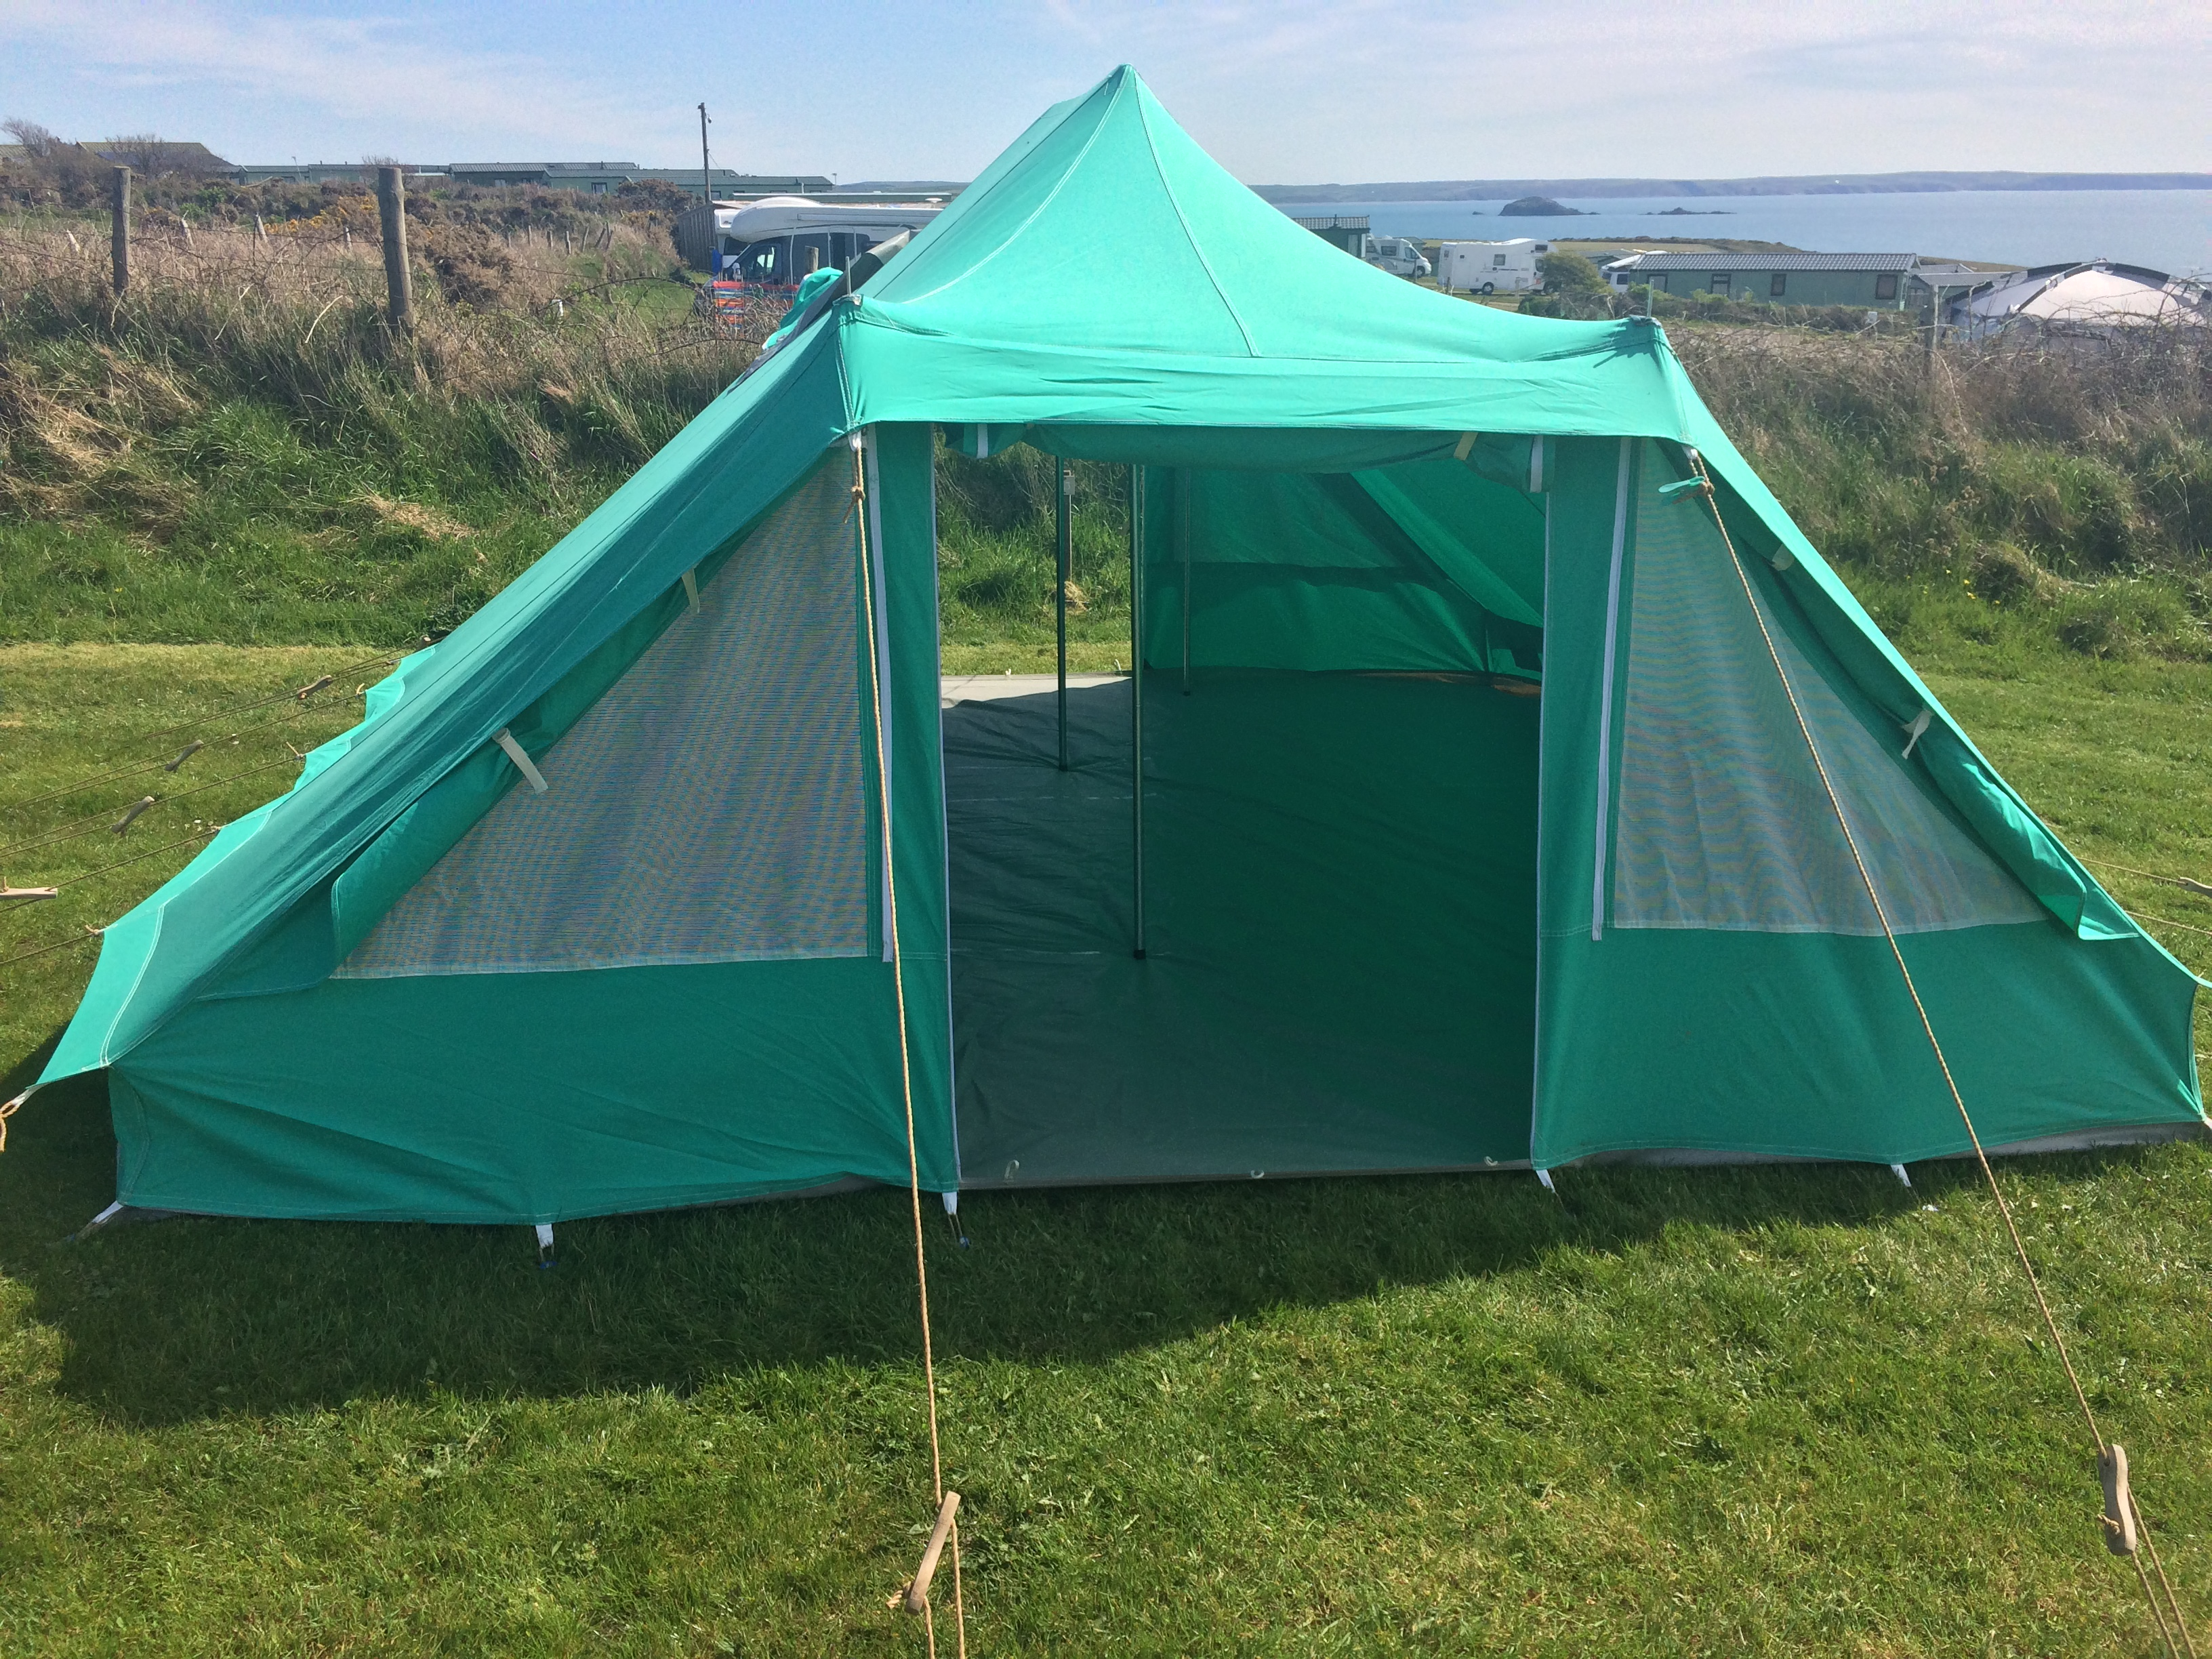 Nepal tent - dual entrance